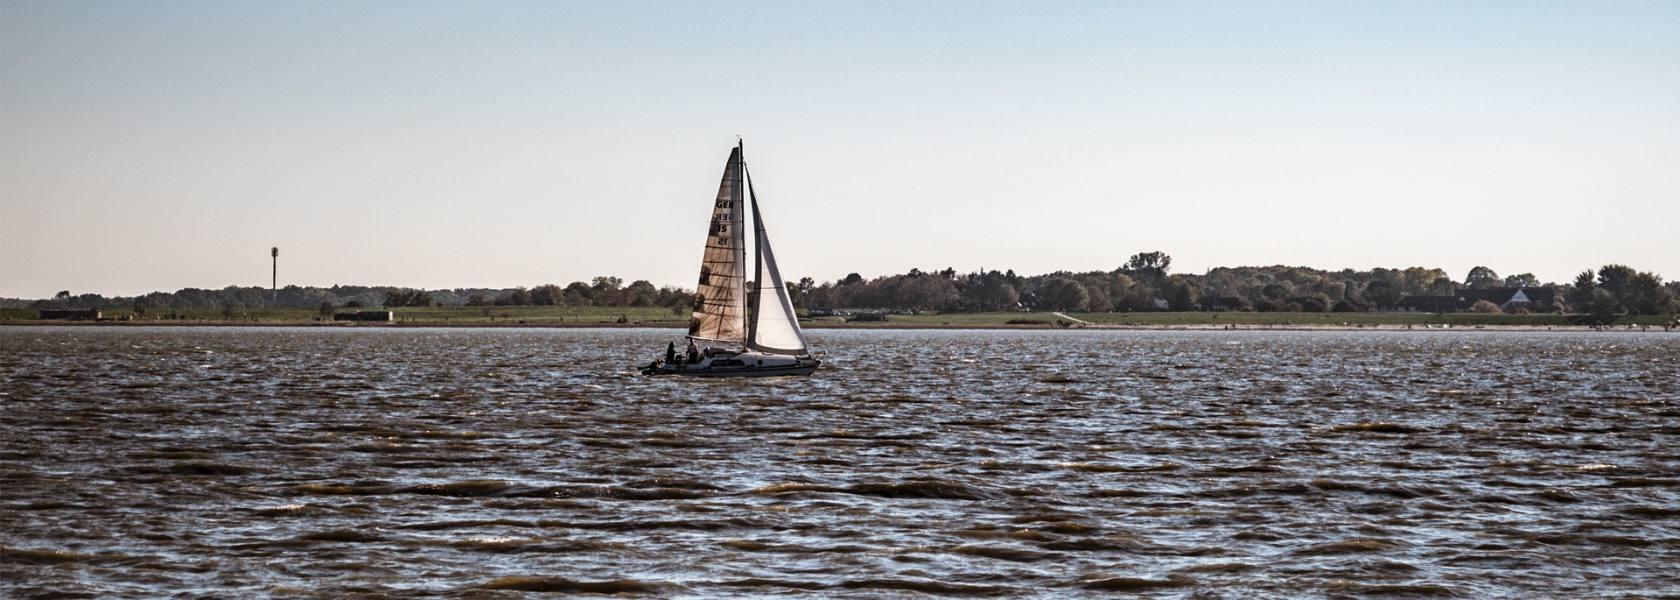 Segelboot auf dem Jadebusen, © Andrea Ullius, ullala.ch